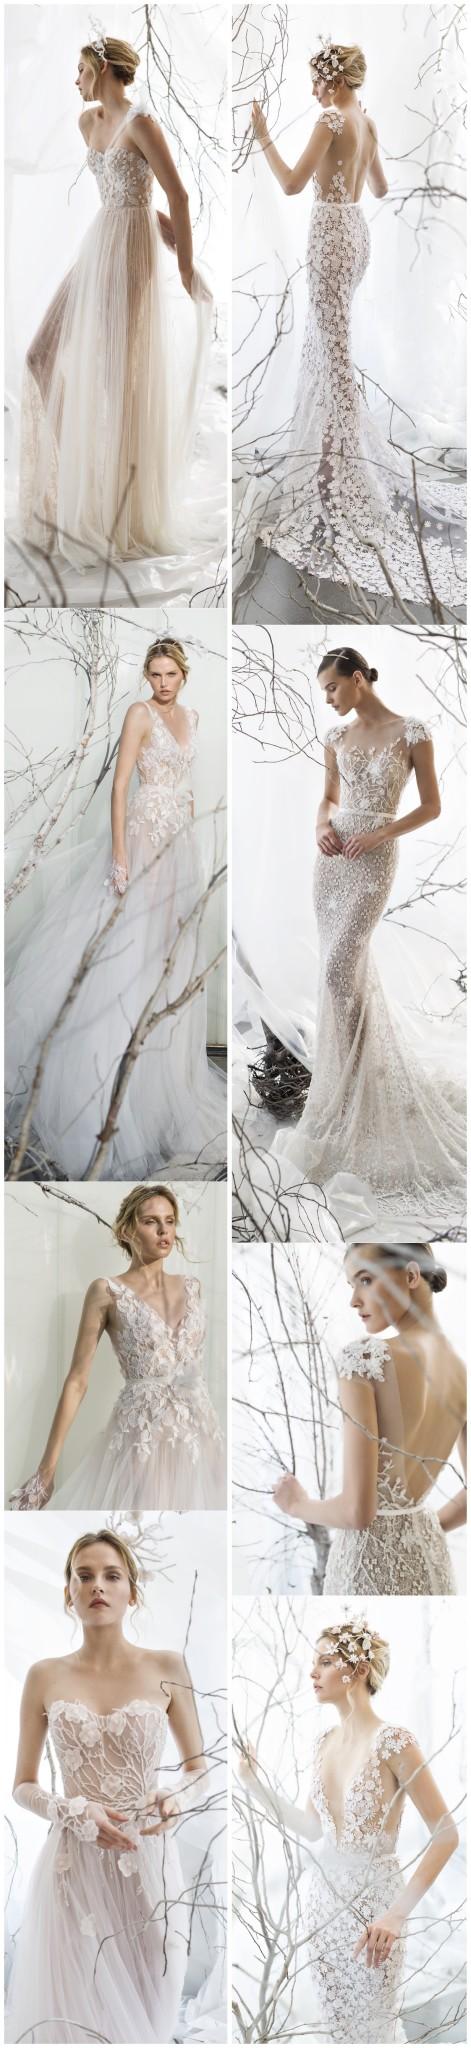 spring wedding dresses design